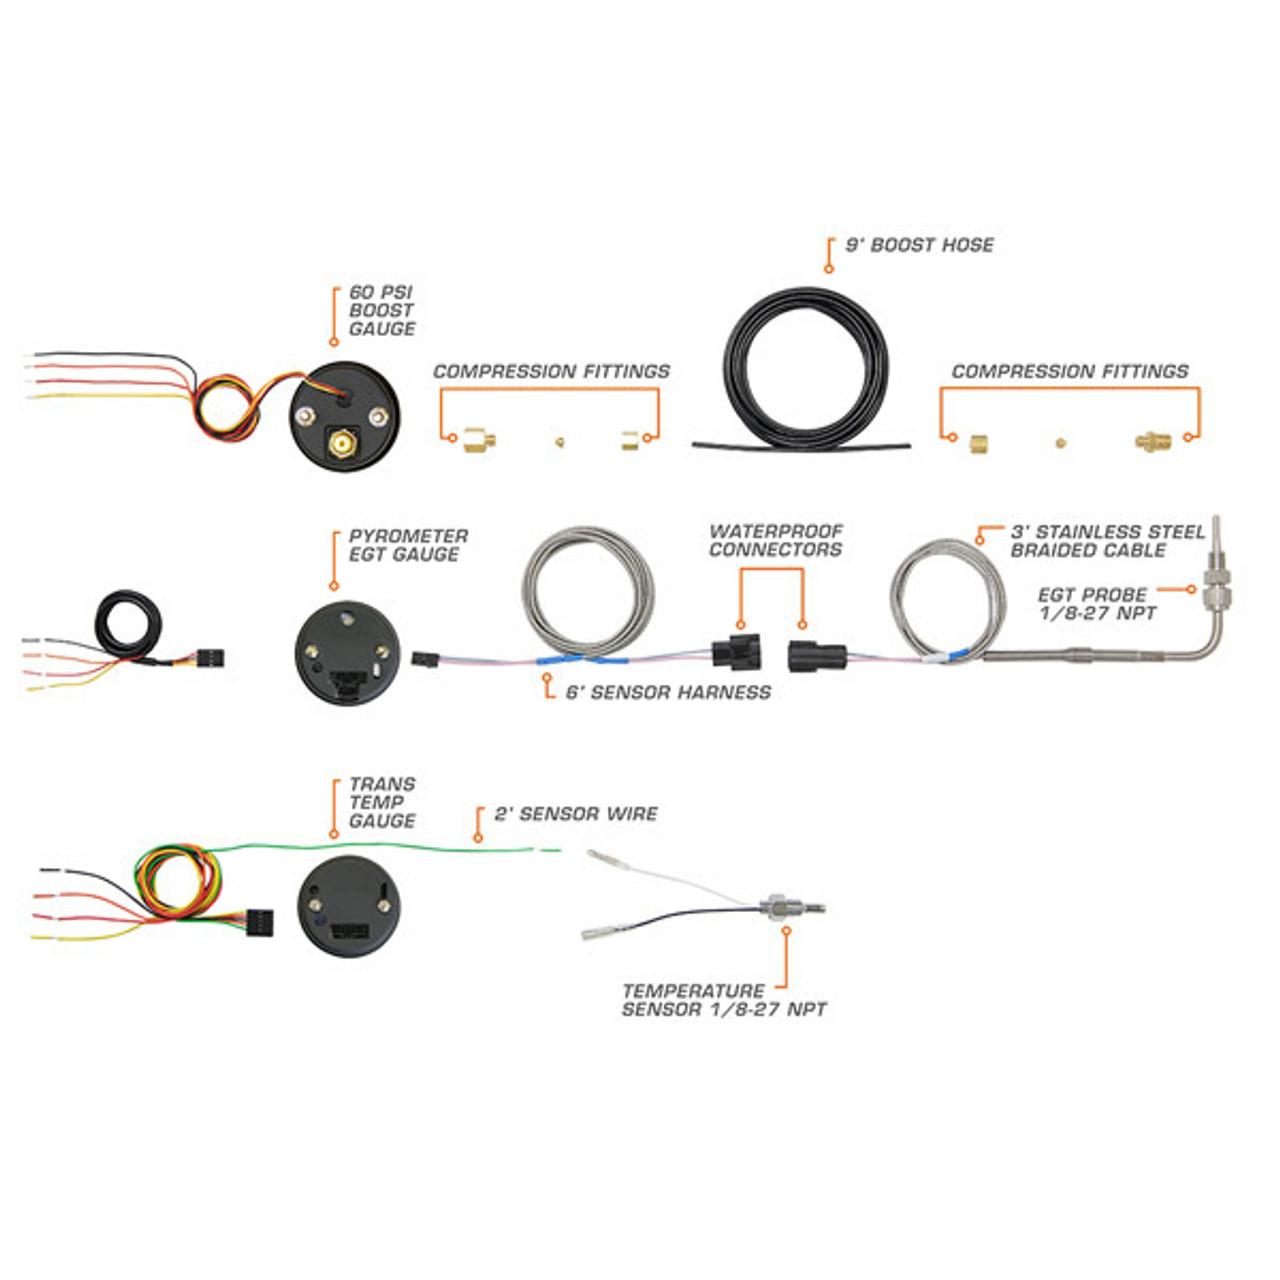 [SCHEMATICS_43NM]  GlowShift White 7 Color Series Diesel Gauge Set Boost, Pyrometer, Trans Temp   Wiring Diagram For Glowshift Boost Gauge      GlowShift